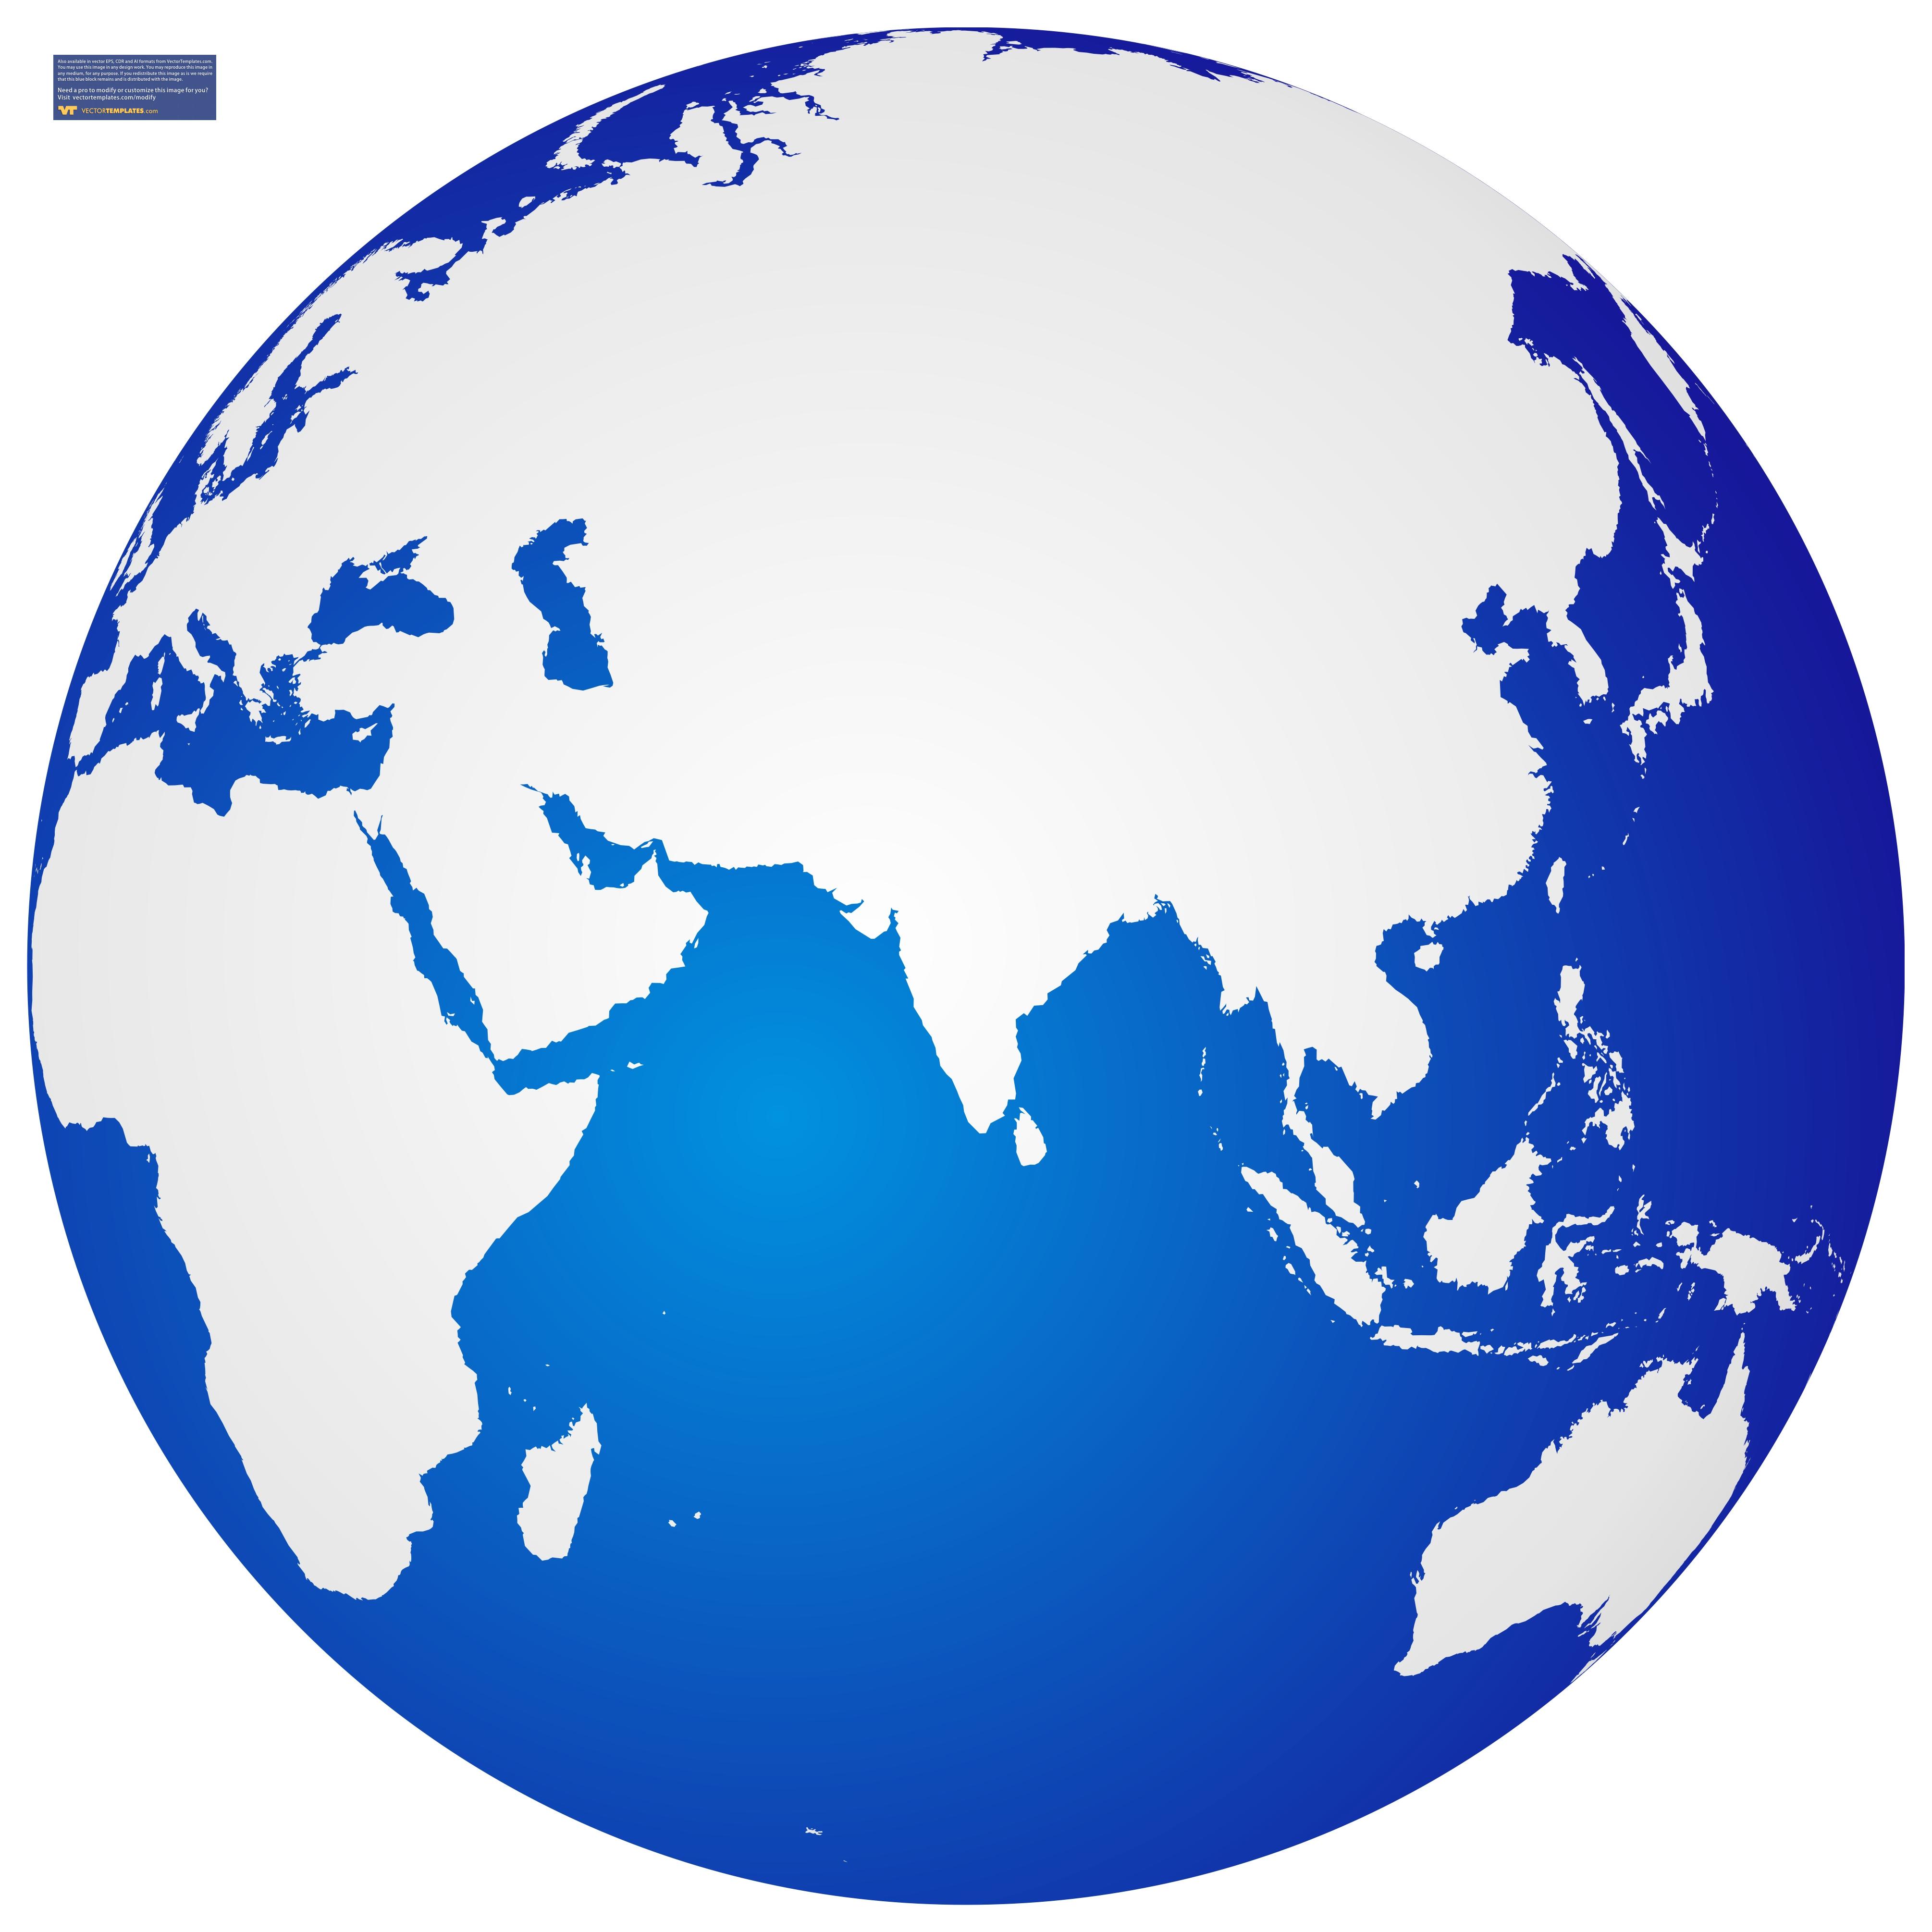 4021x4021 Transparent World Globe Clipart